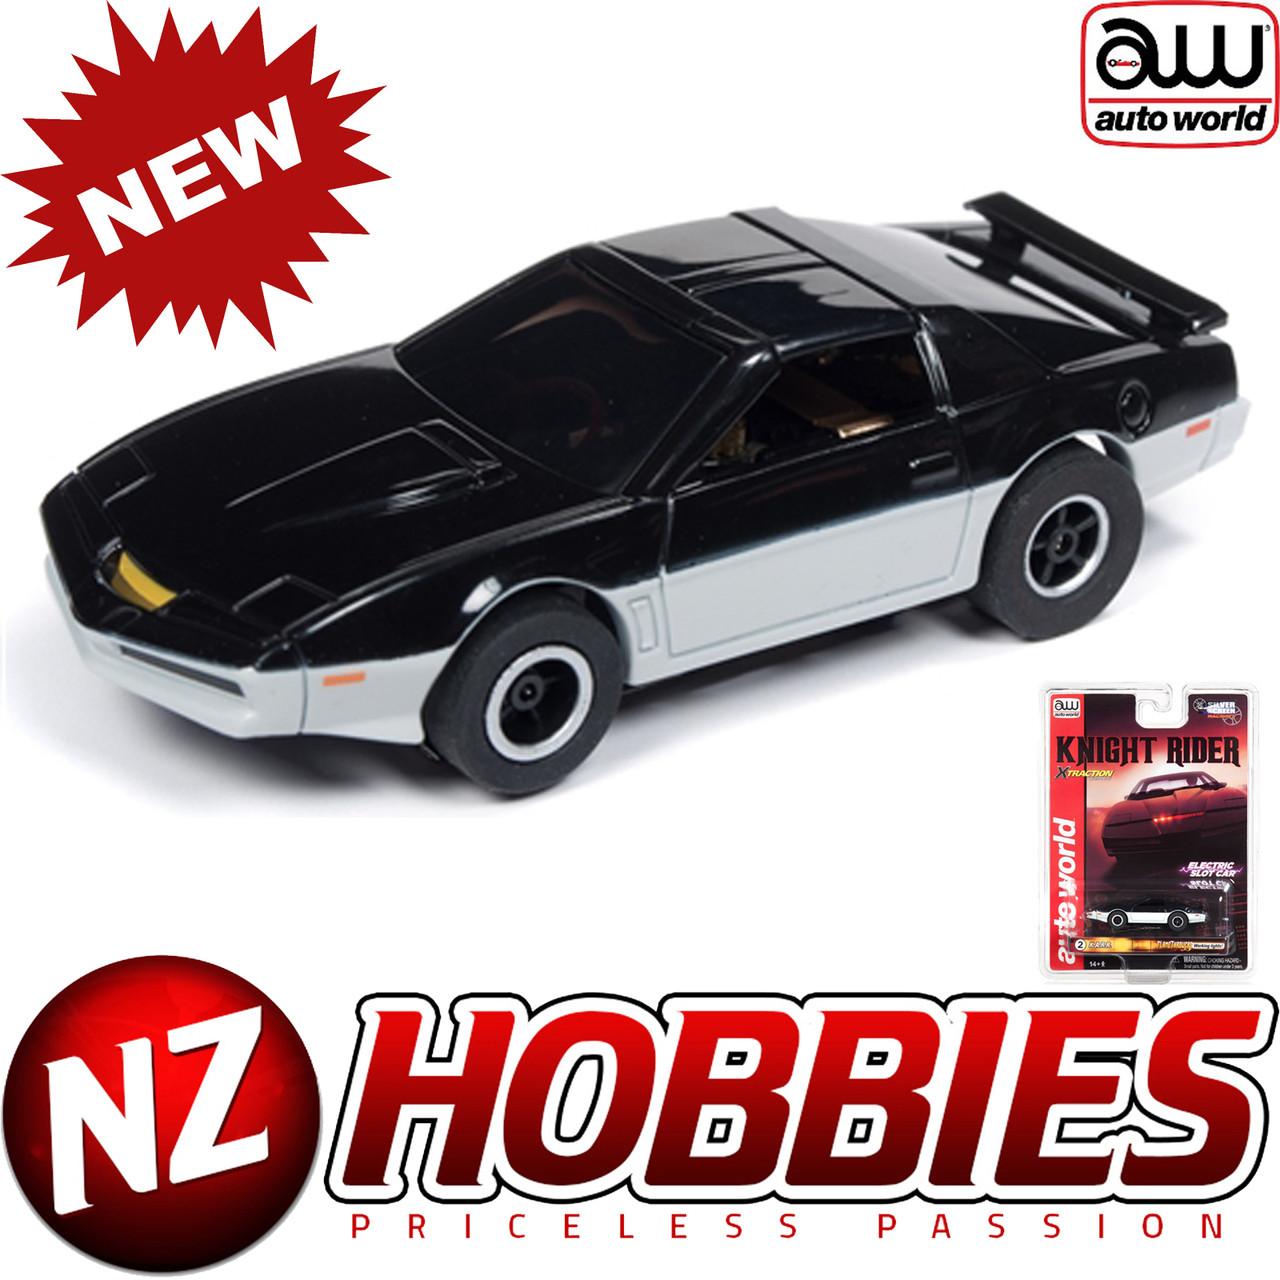 Auto World Xtraction R25 Knight Rider (K A R R) HO Scale Slot Car